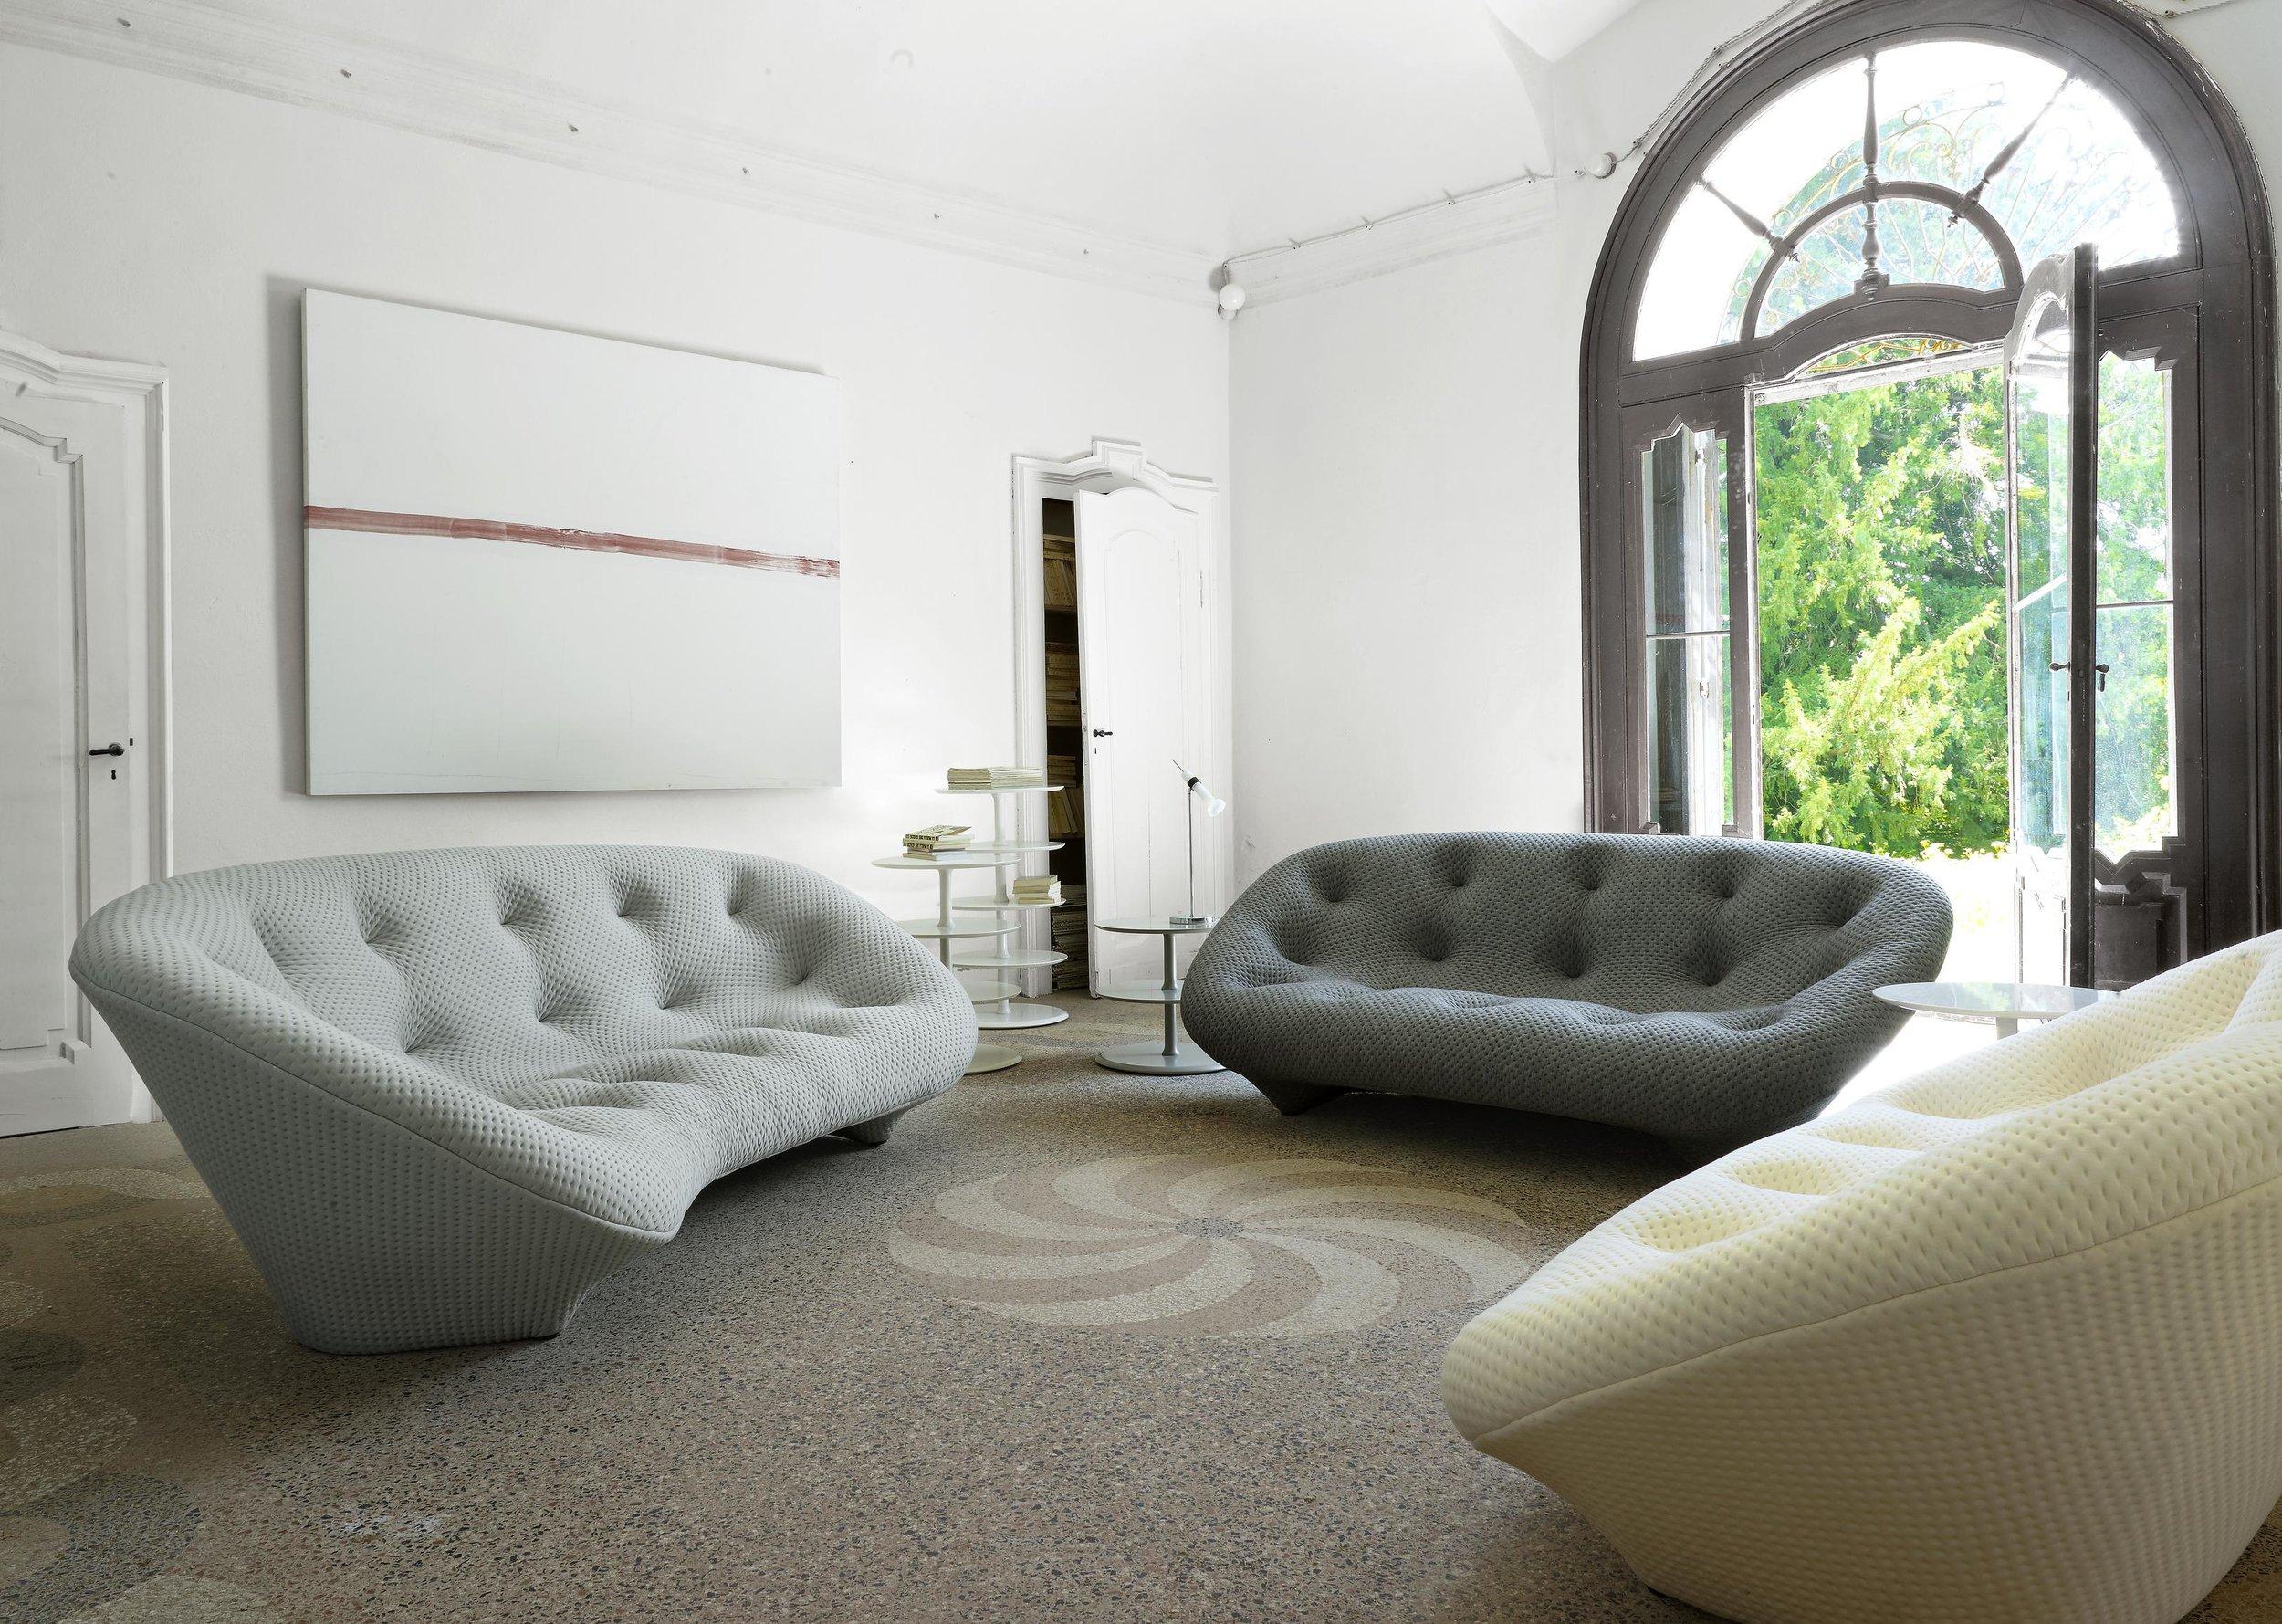 Ploum zetel sofa Ligne Roset design meubelwinkel Loncin Leuven Hasselt mechelen Sint-truiden Brussels Bruxelles Anwterpen Gent 2.jpg